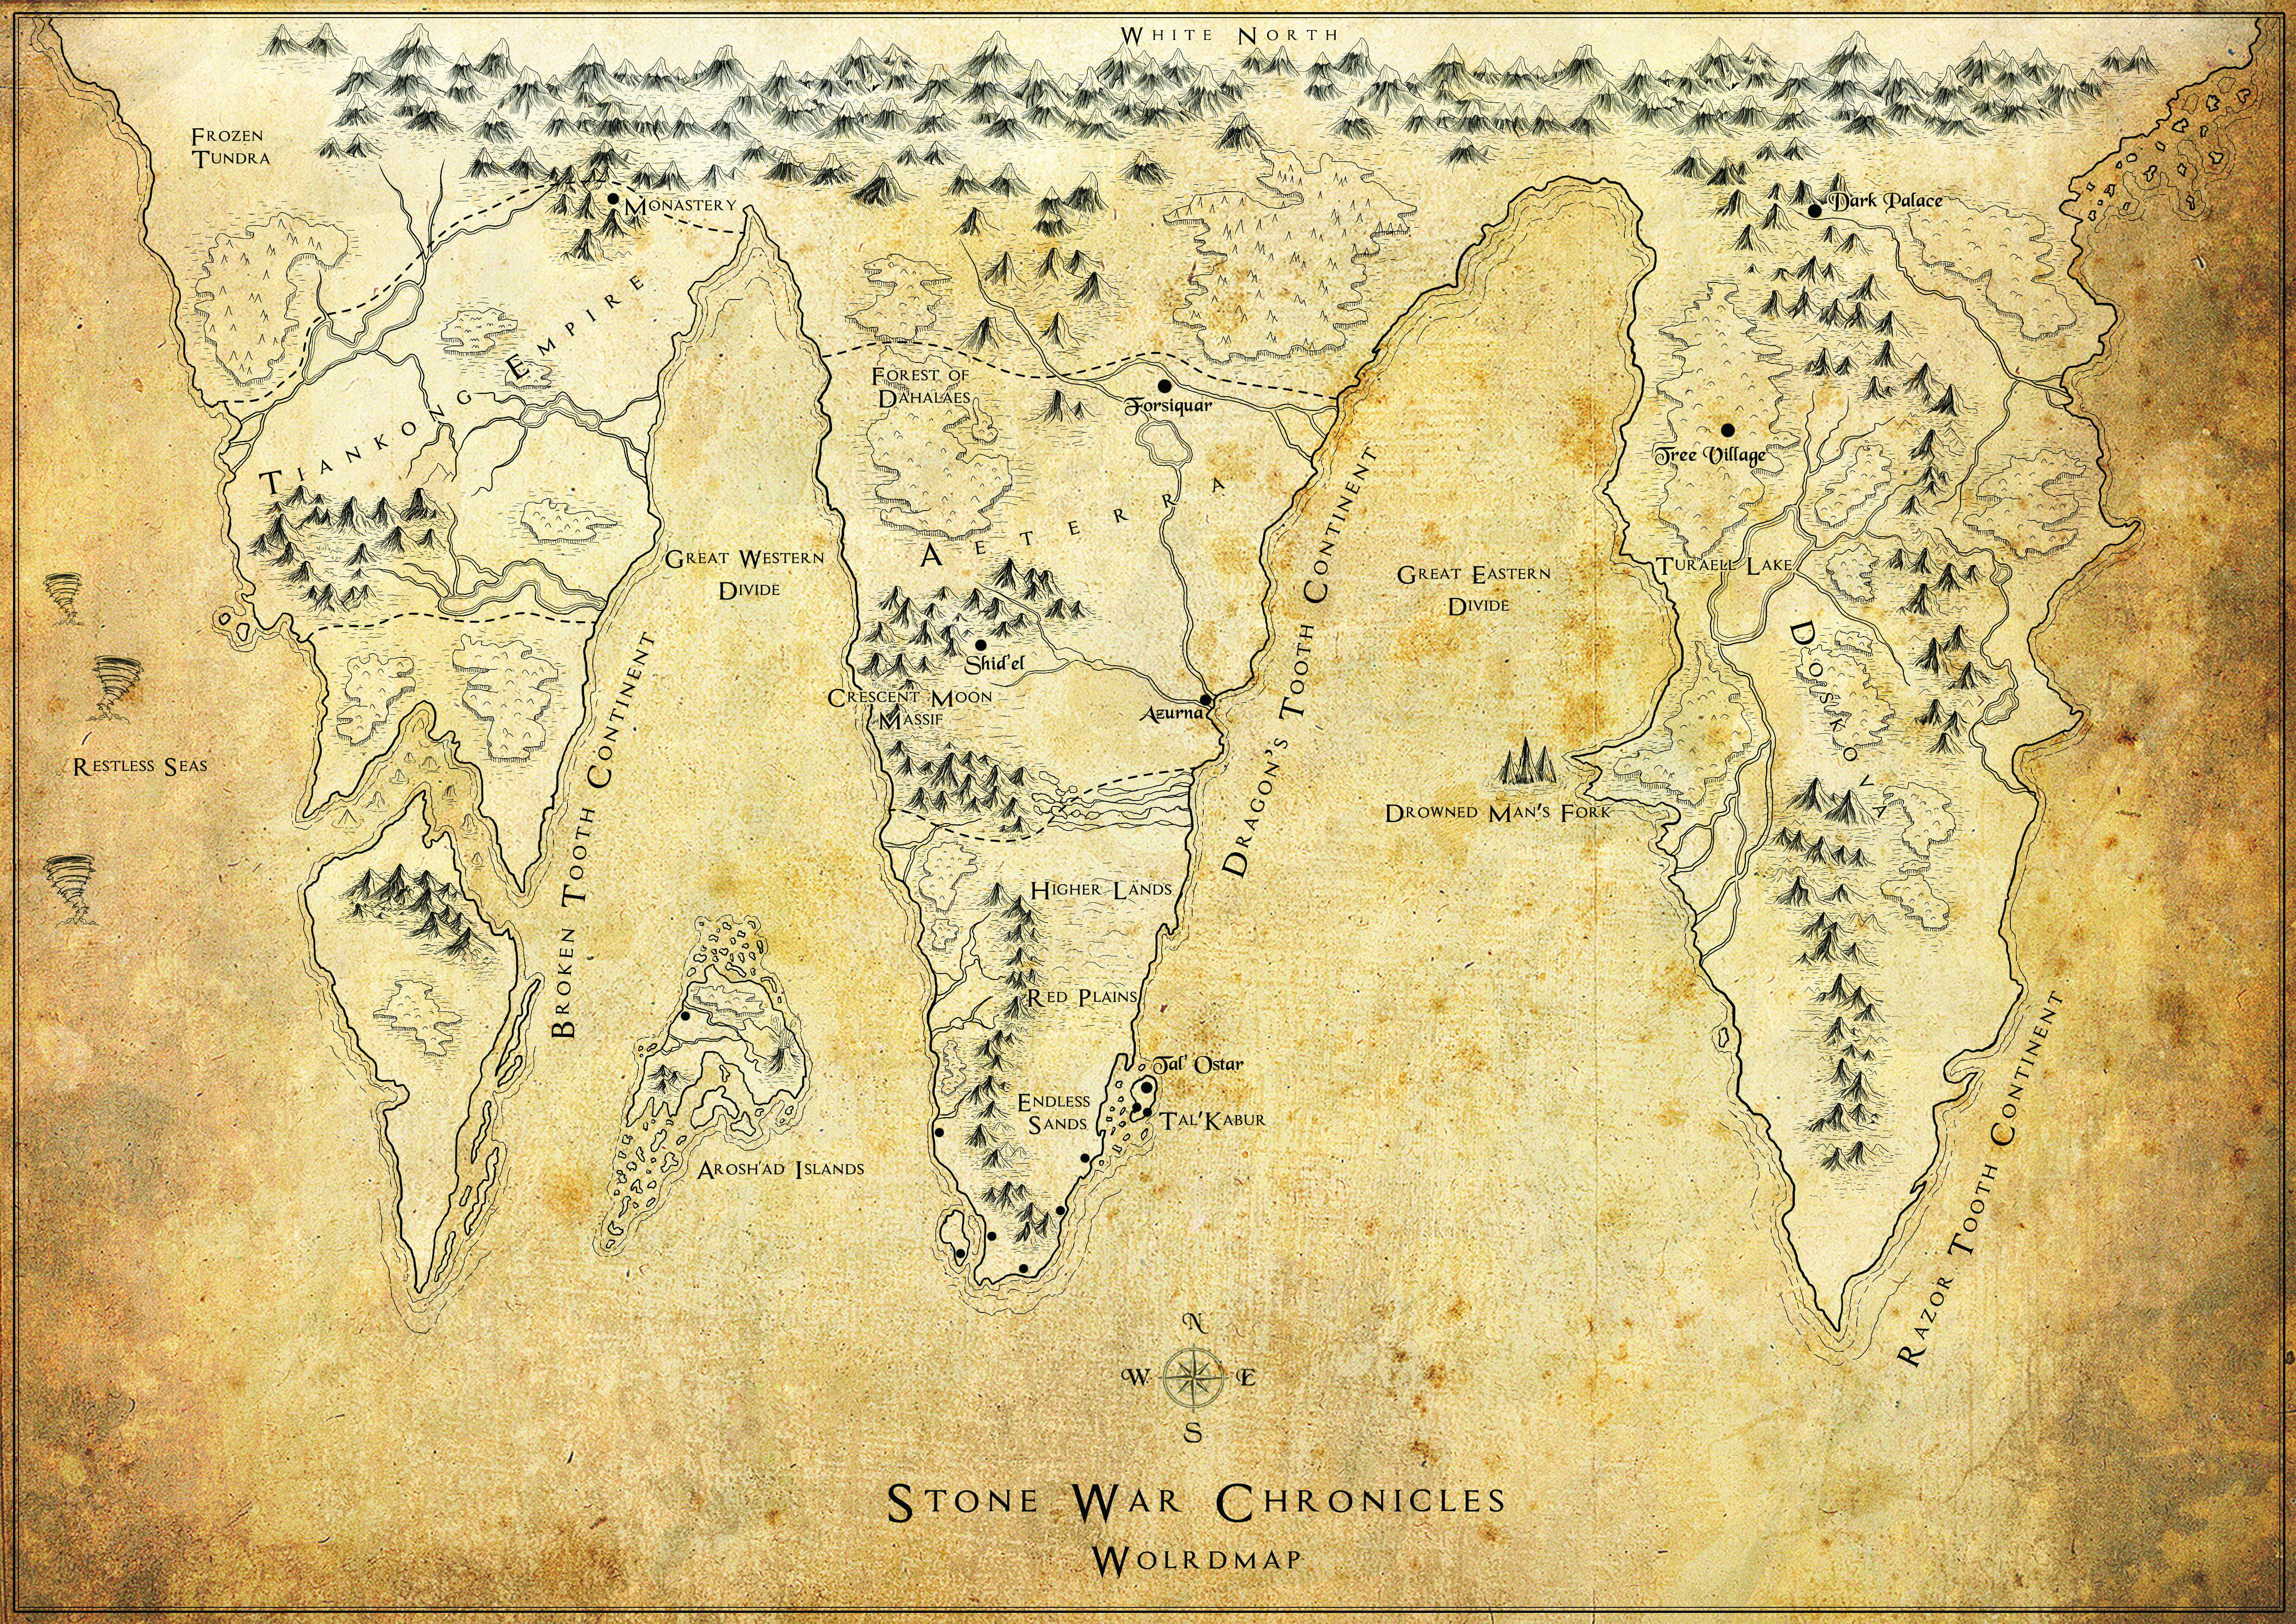 Stone War Chronicles Worldmap